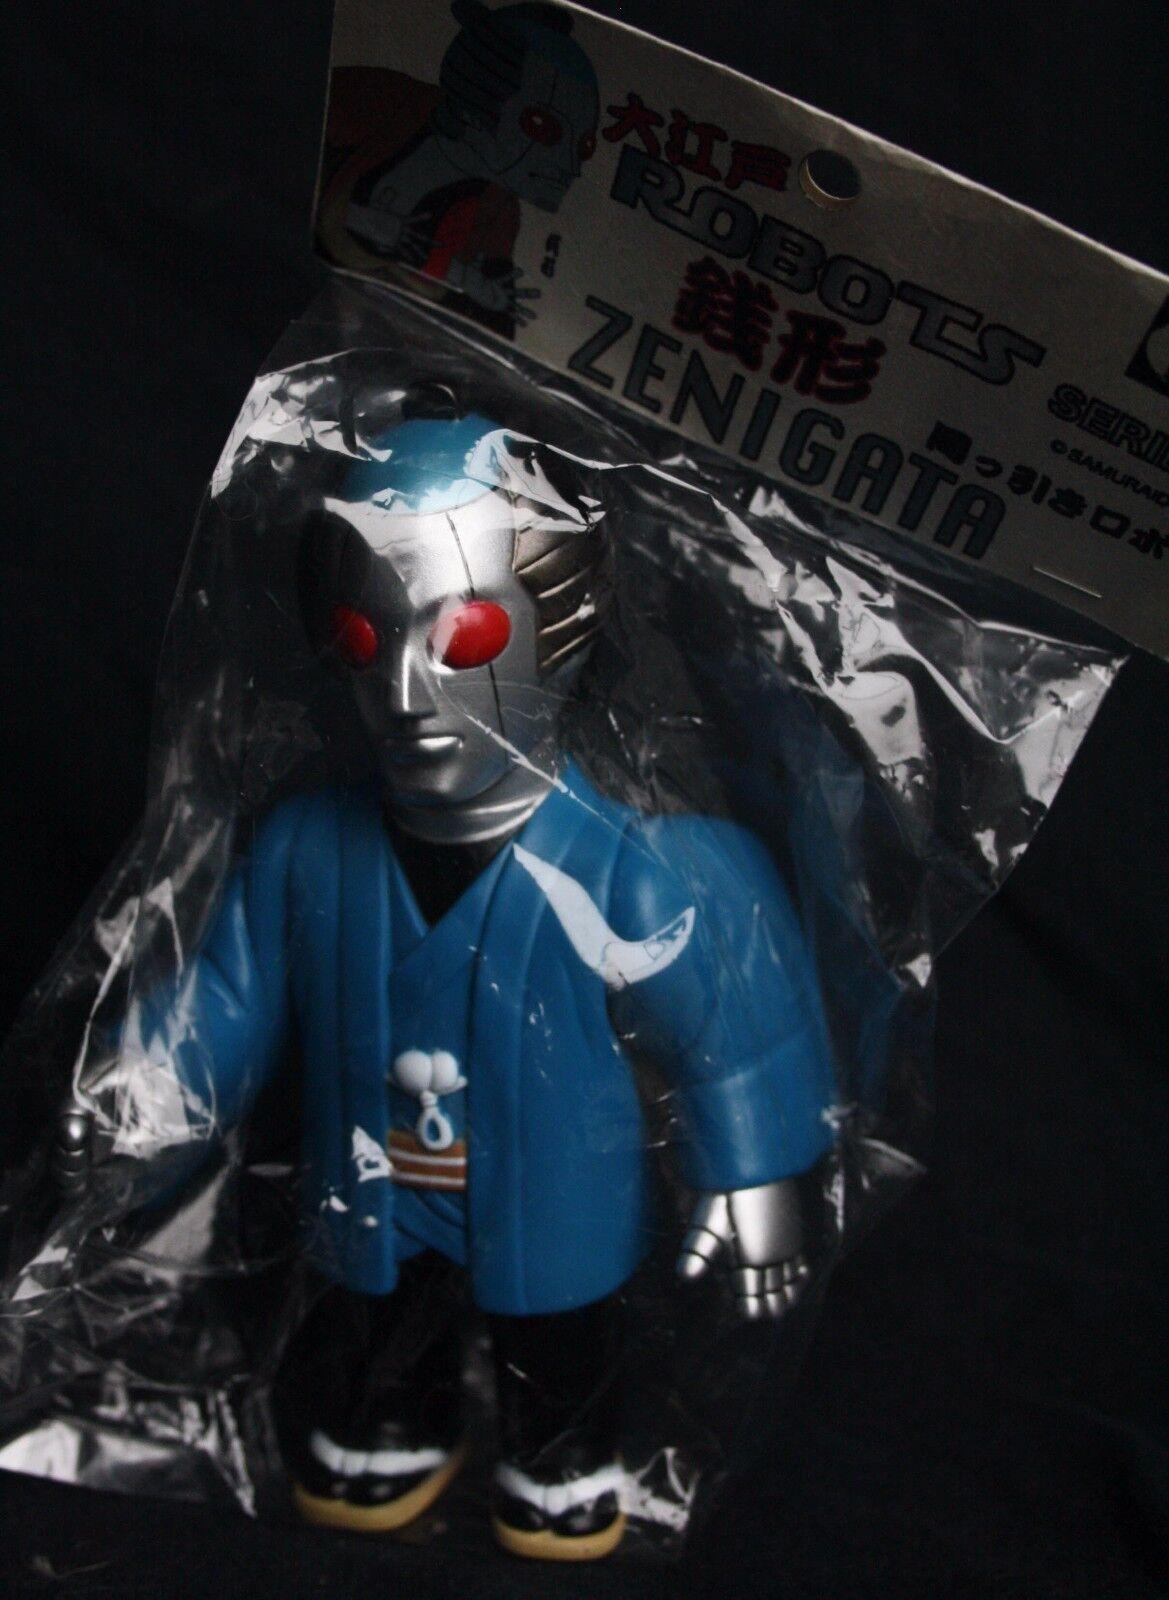 Zenigata robots 6.5 in (approx. 16.51 cm) de alto Samurai Muñeca Menta en caja Japón Mancha Kaiju Pushead Bemon